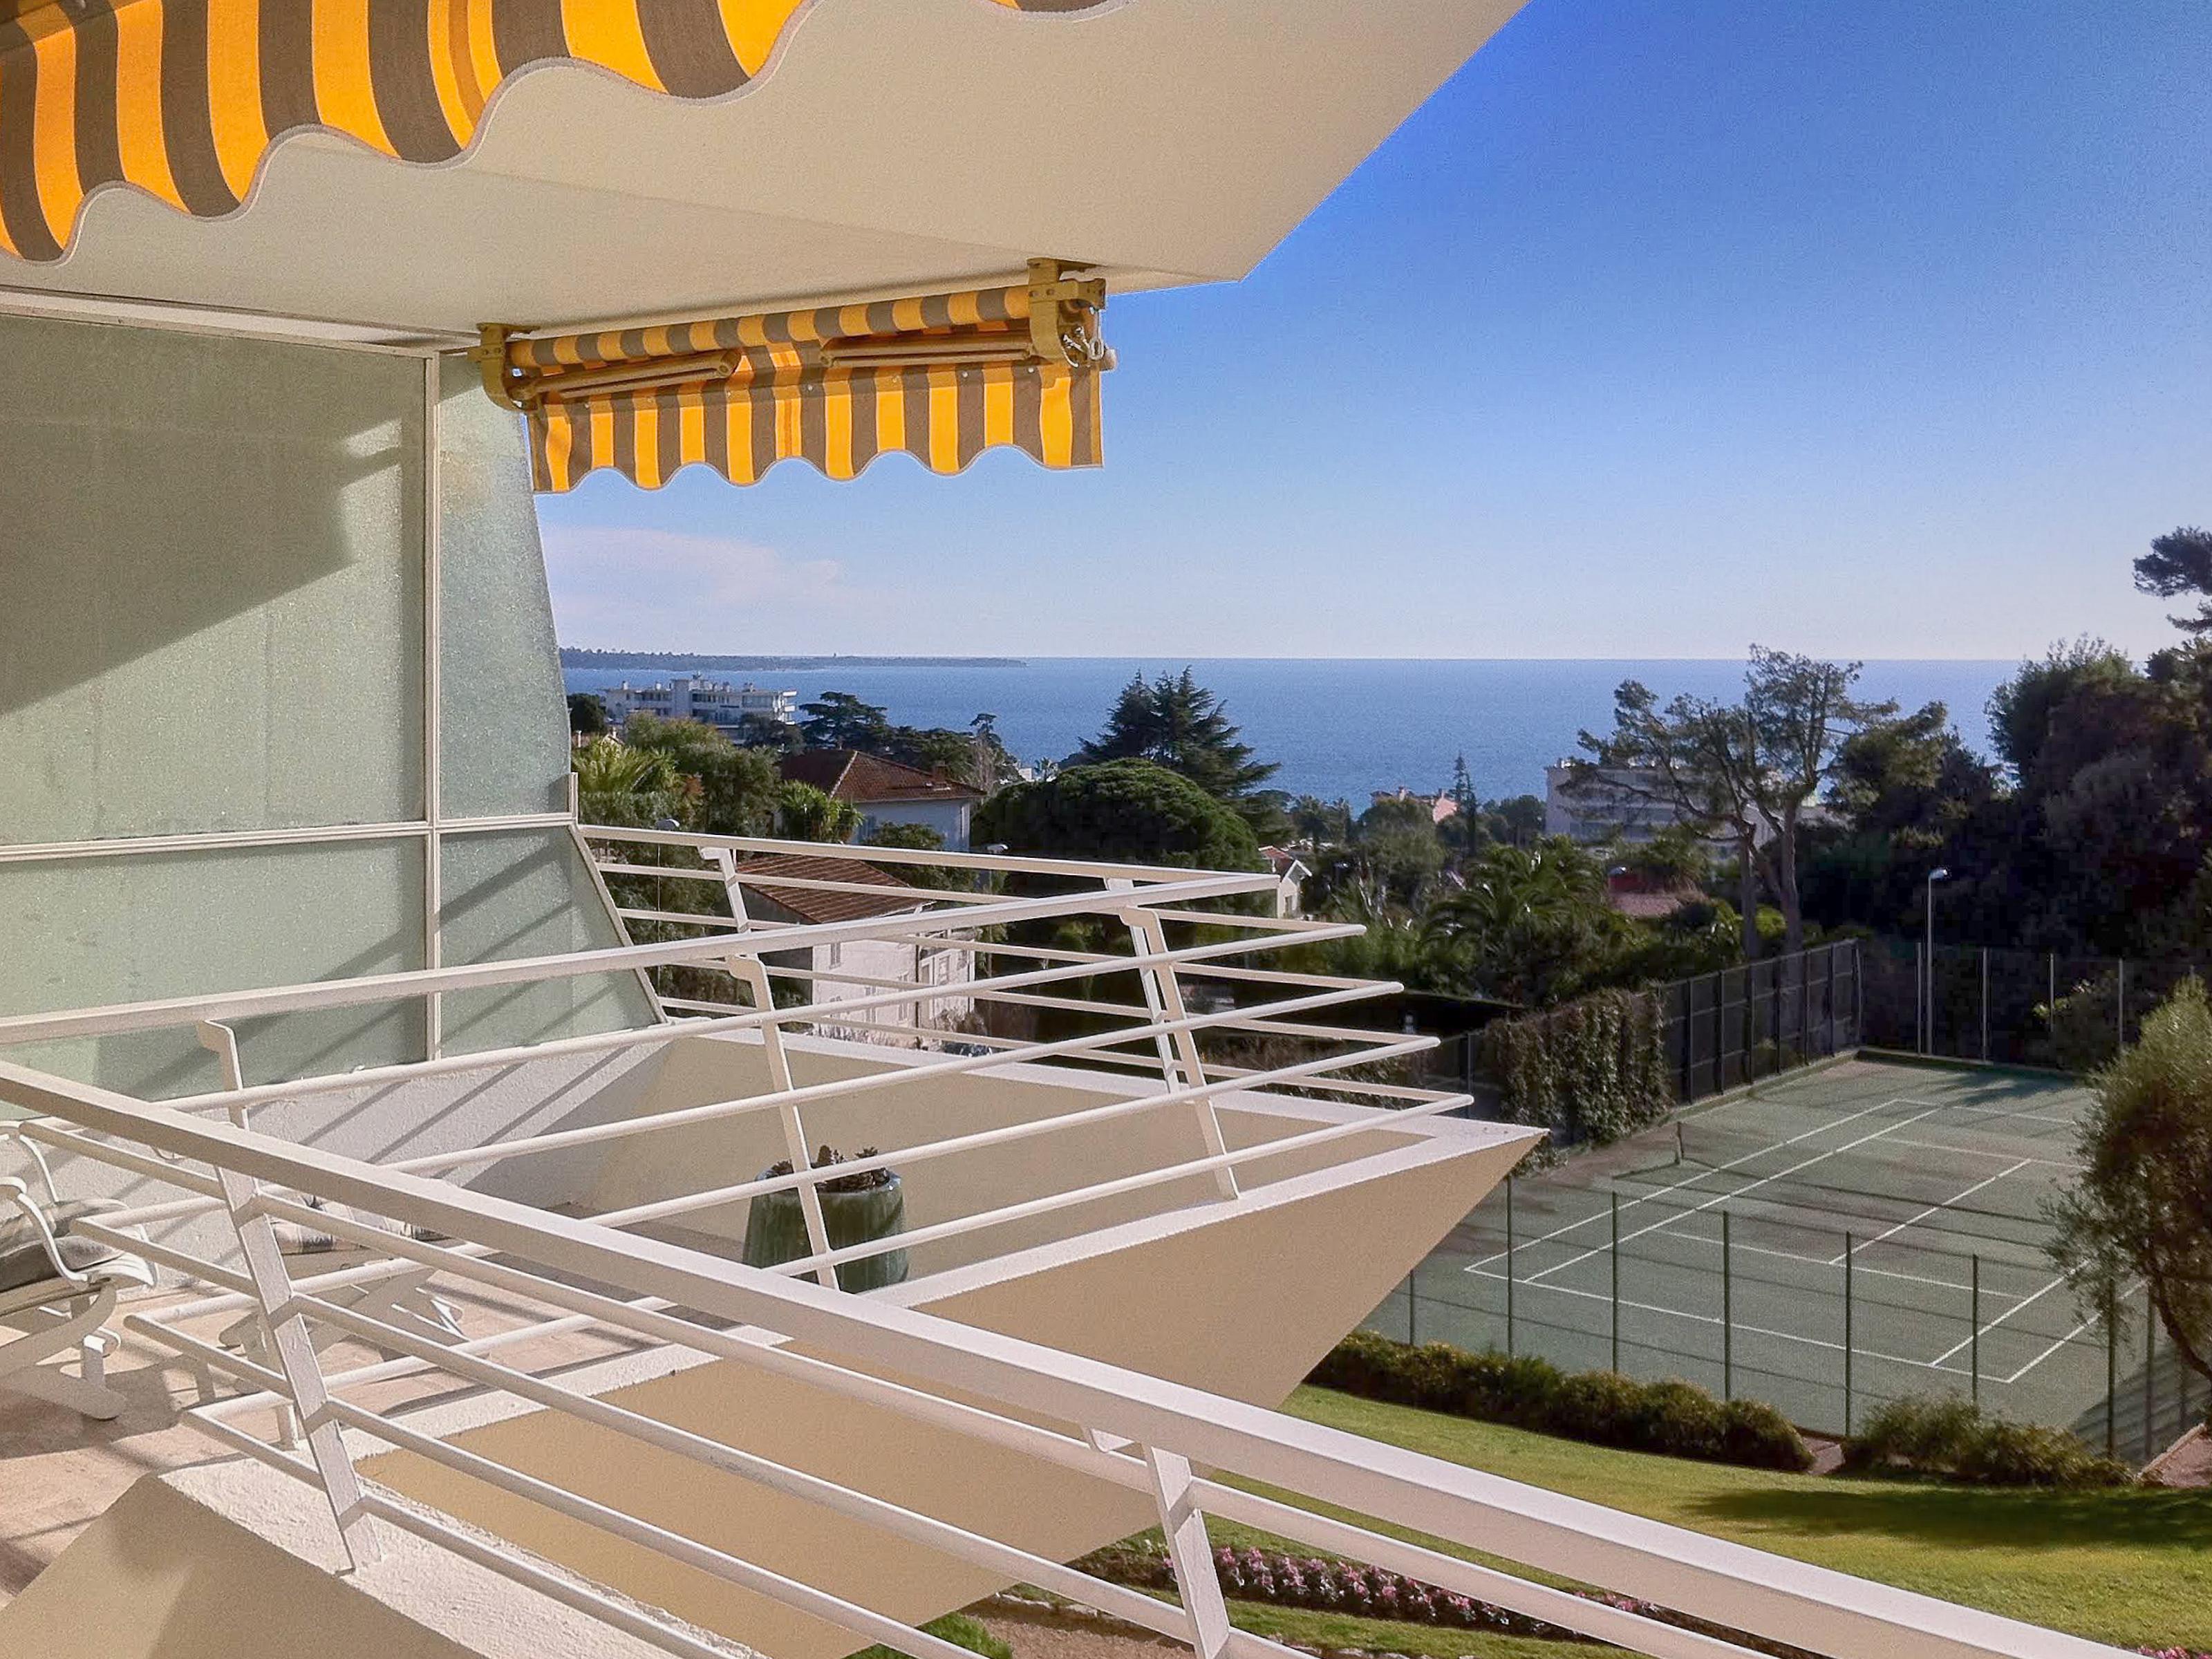 Appartamento per Vendita alle ore Splendid 2 bedroomed apartment for sale - ideal for seasonal rentals Cannes Cannes, Provenza-Alpi-Costa Azzurra 06150 Francia